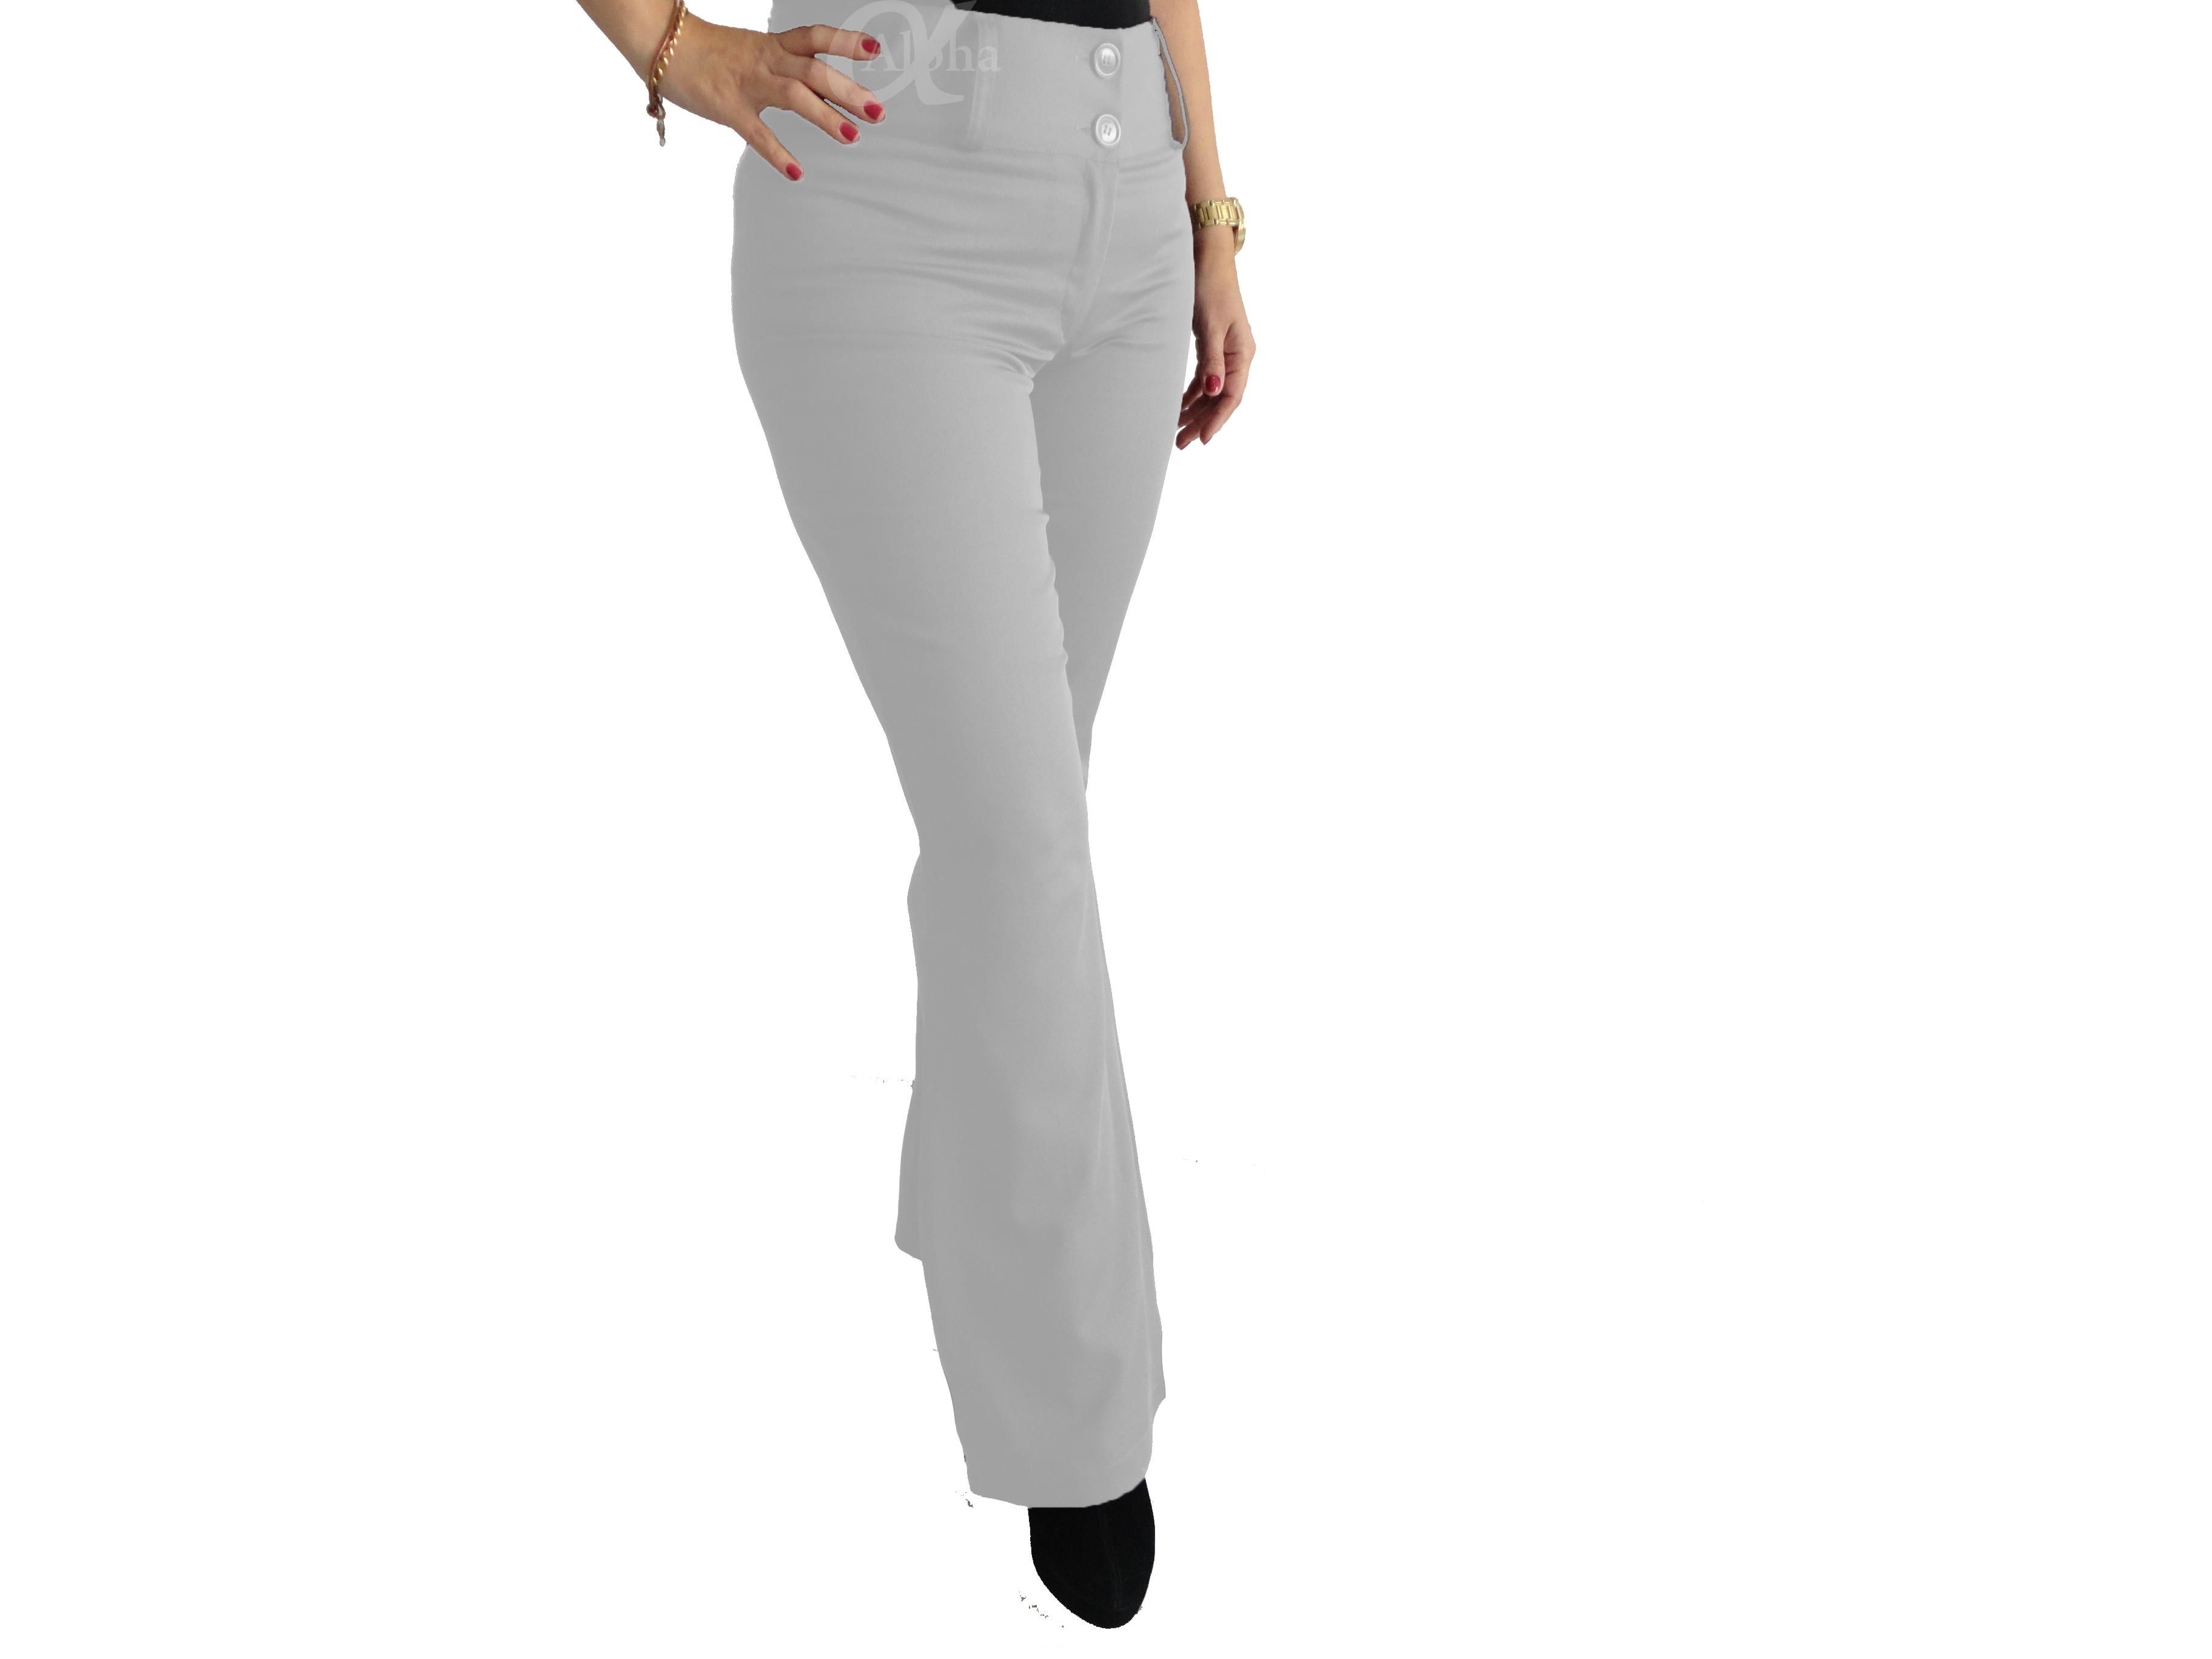 e94dd39970 Calça Flare Social Cintura Alta Branca - Alpha Moda Social